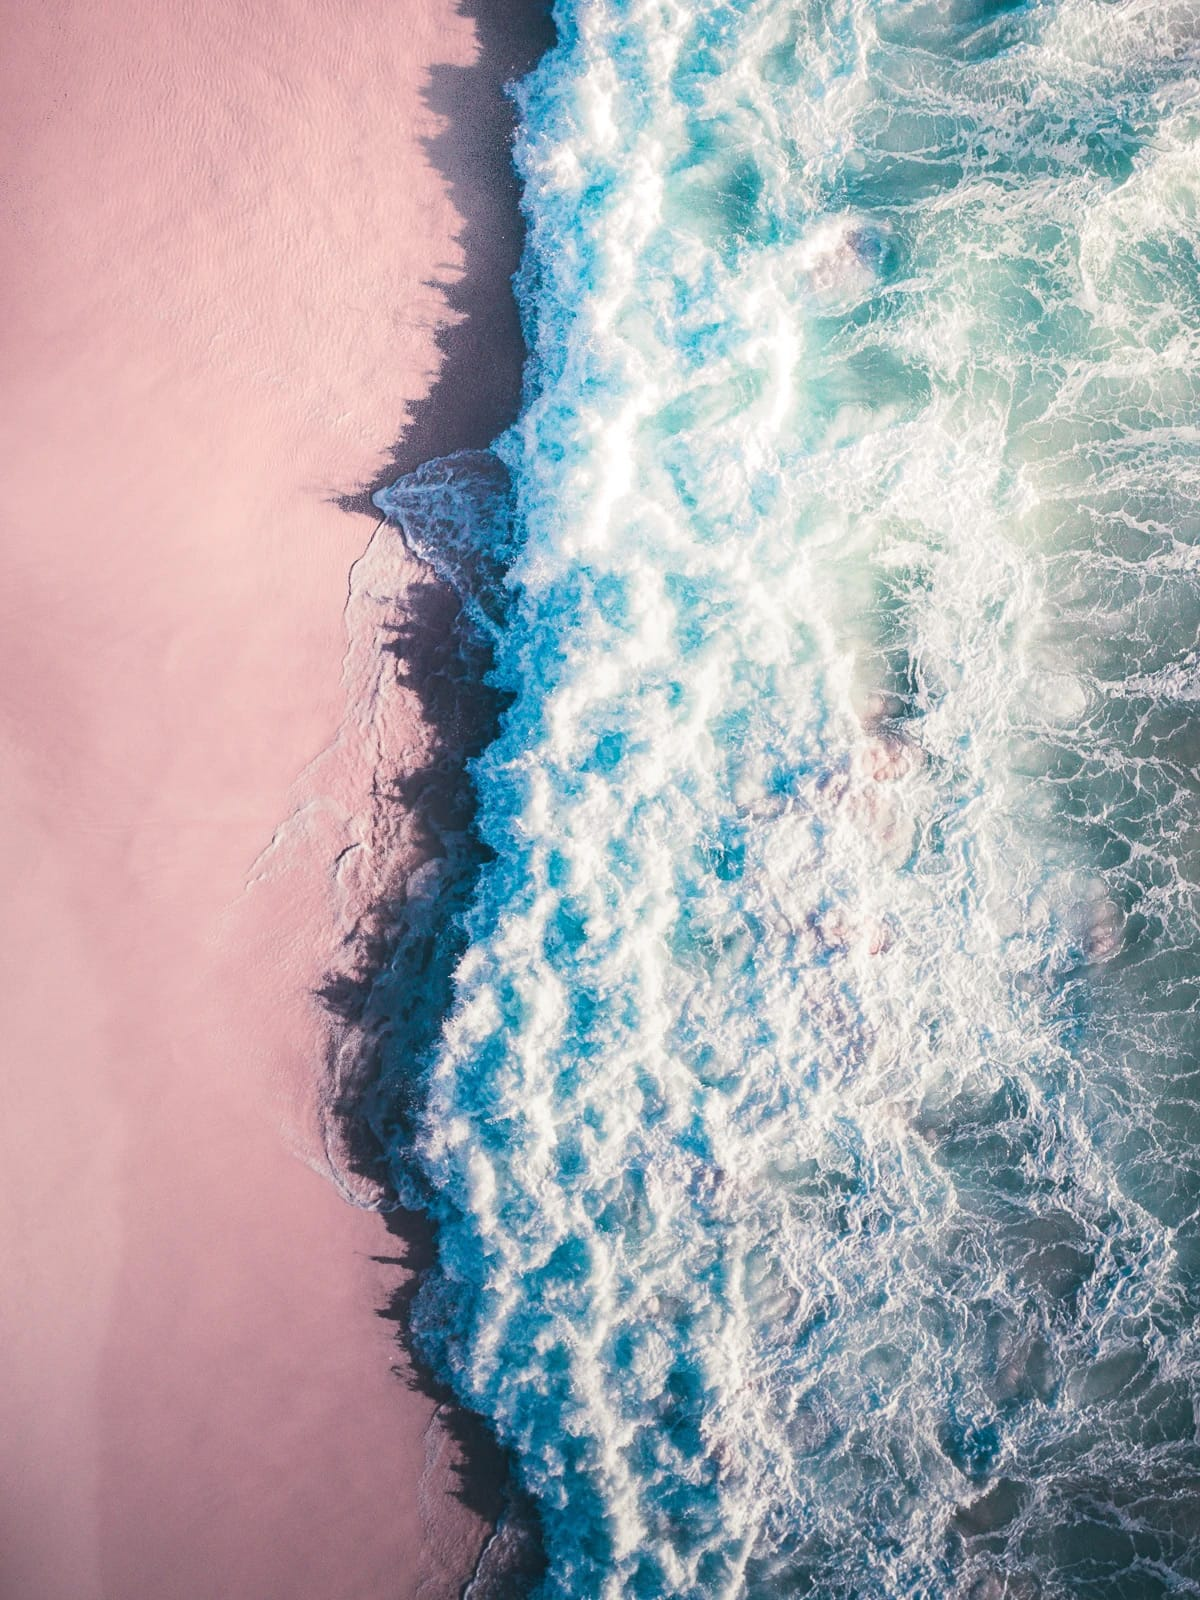 tobias hagg aerial photography 1